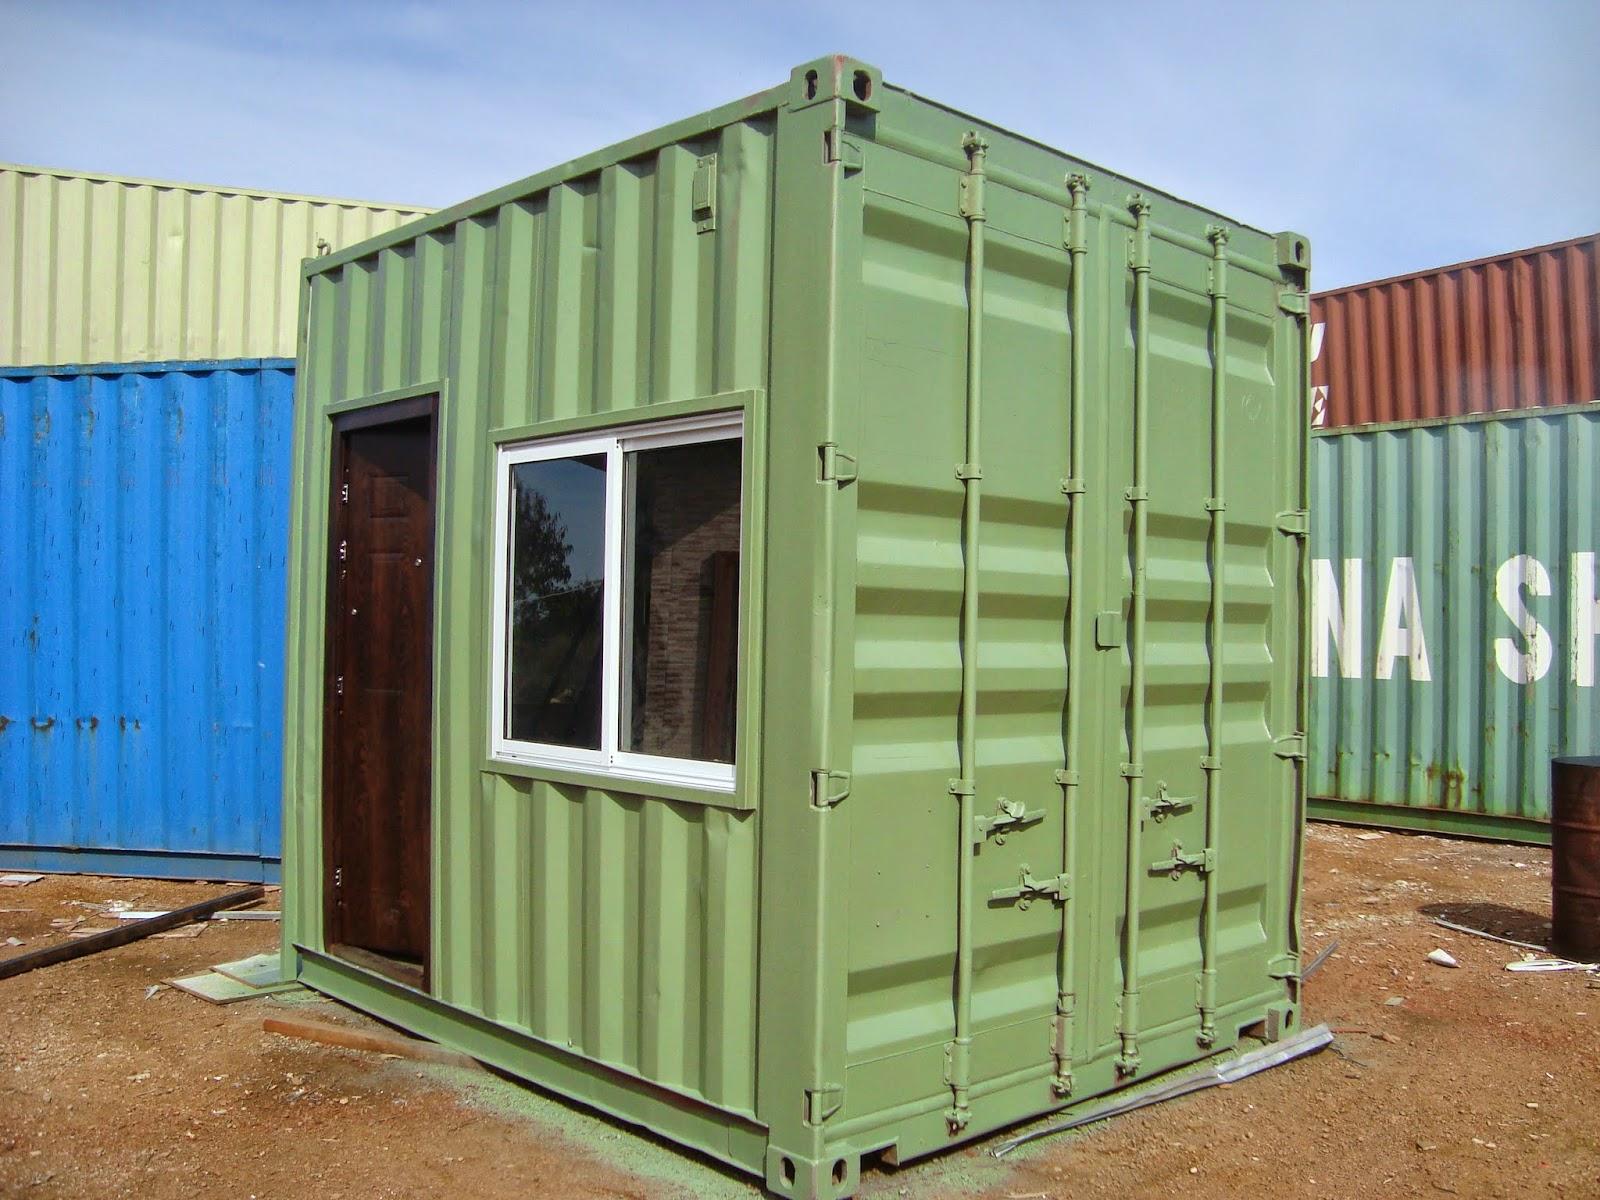 Modificacion de contenedores casa con contenedores - Contenedores para casa ...